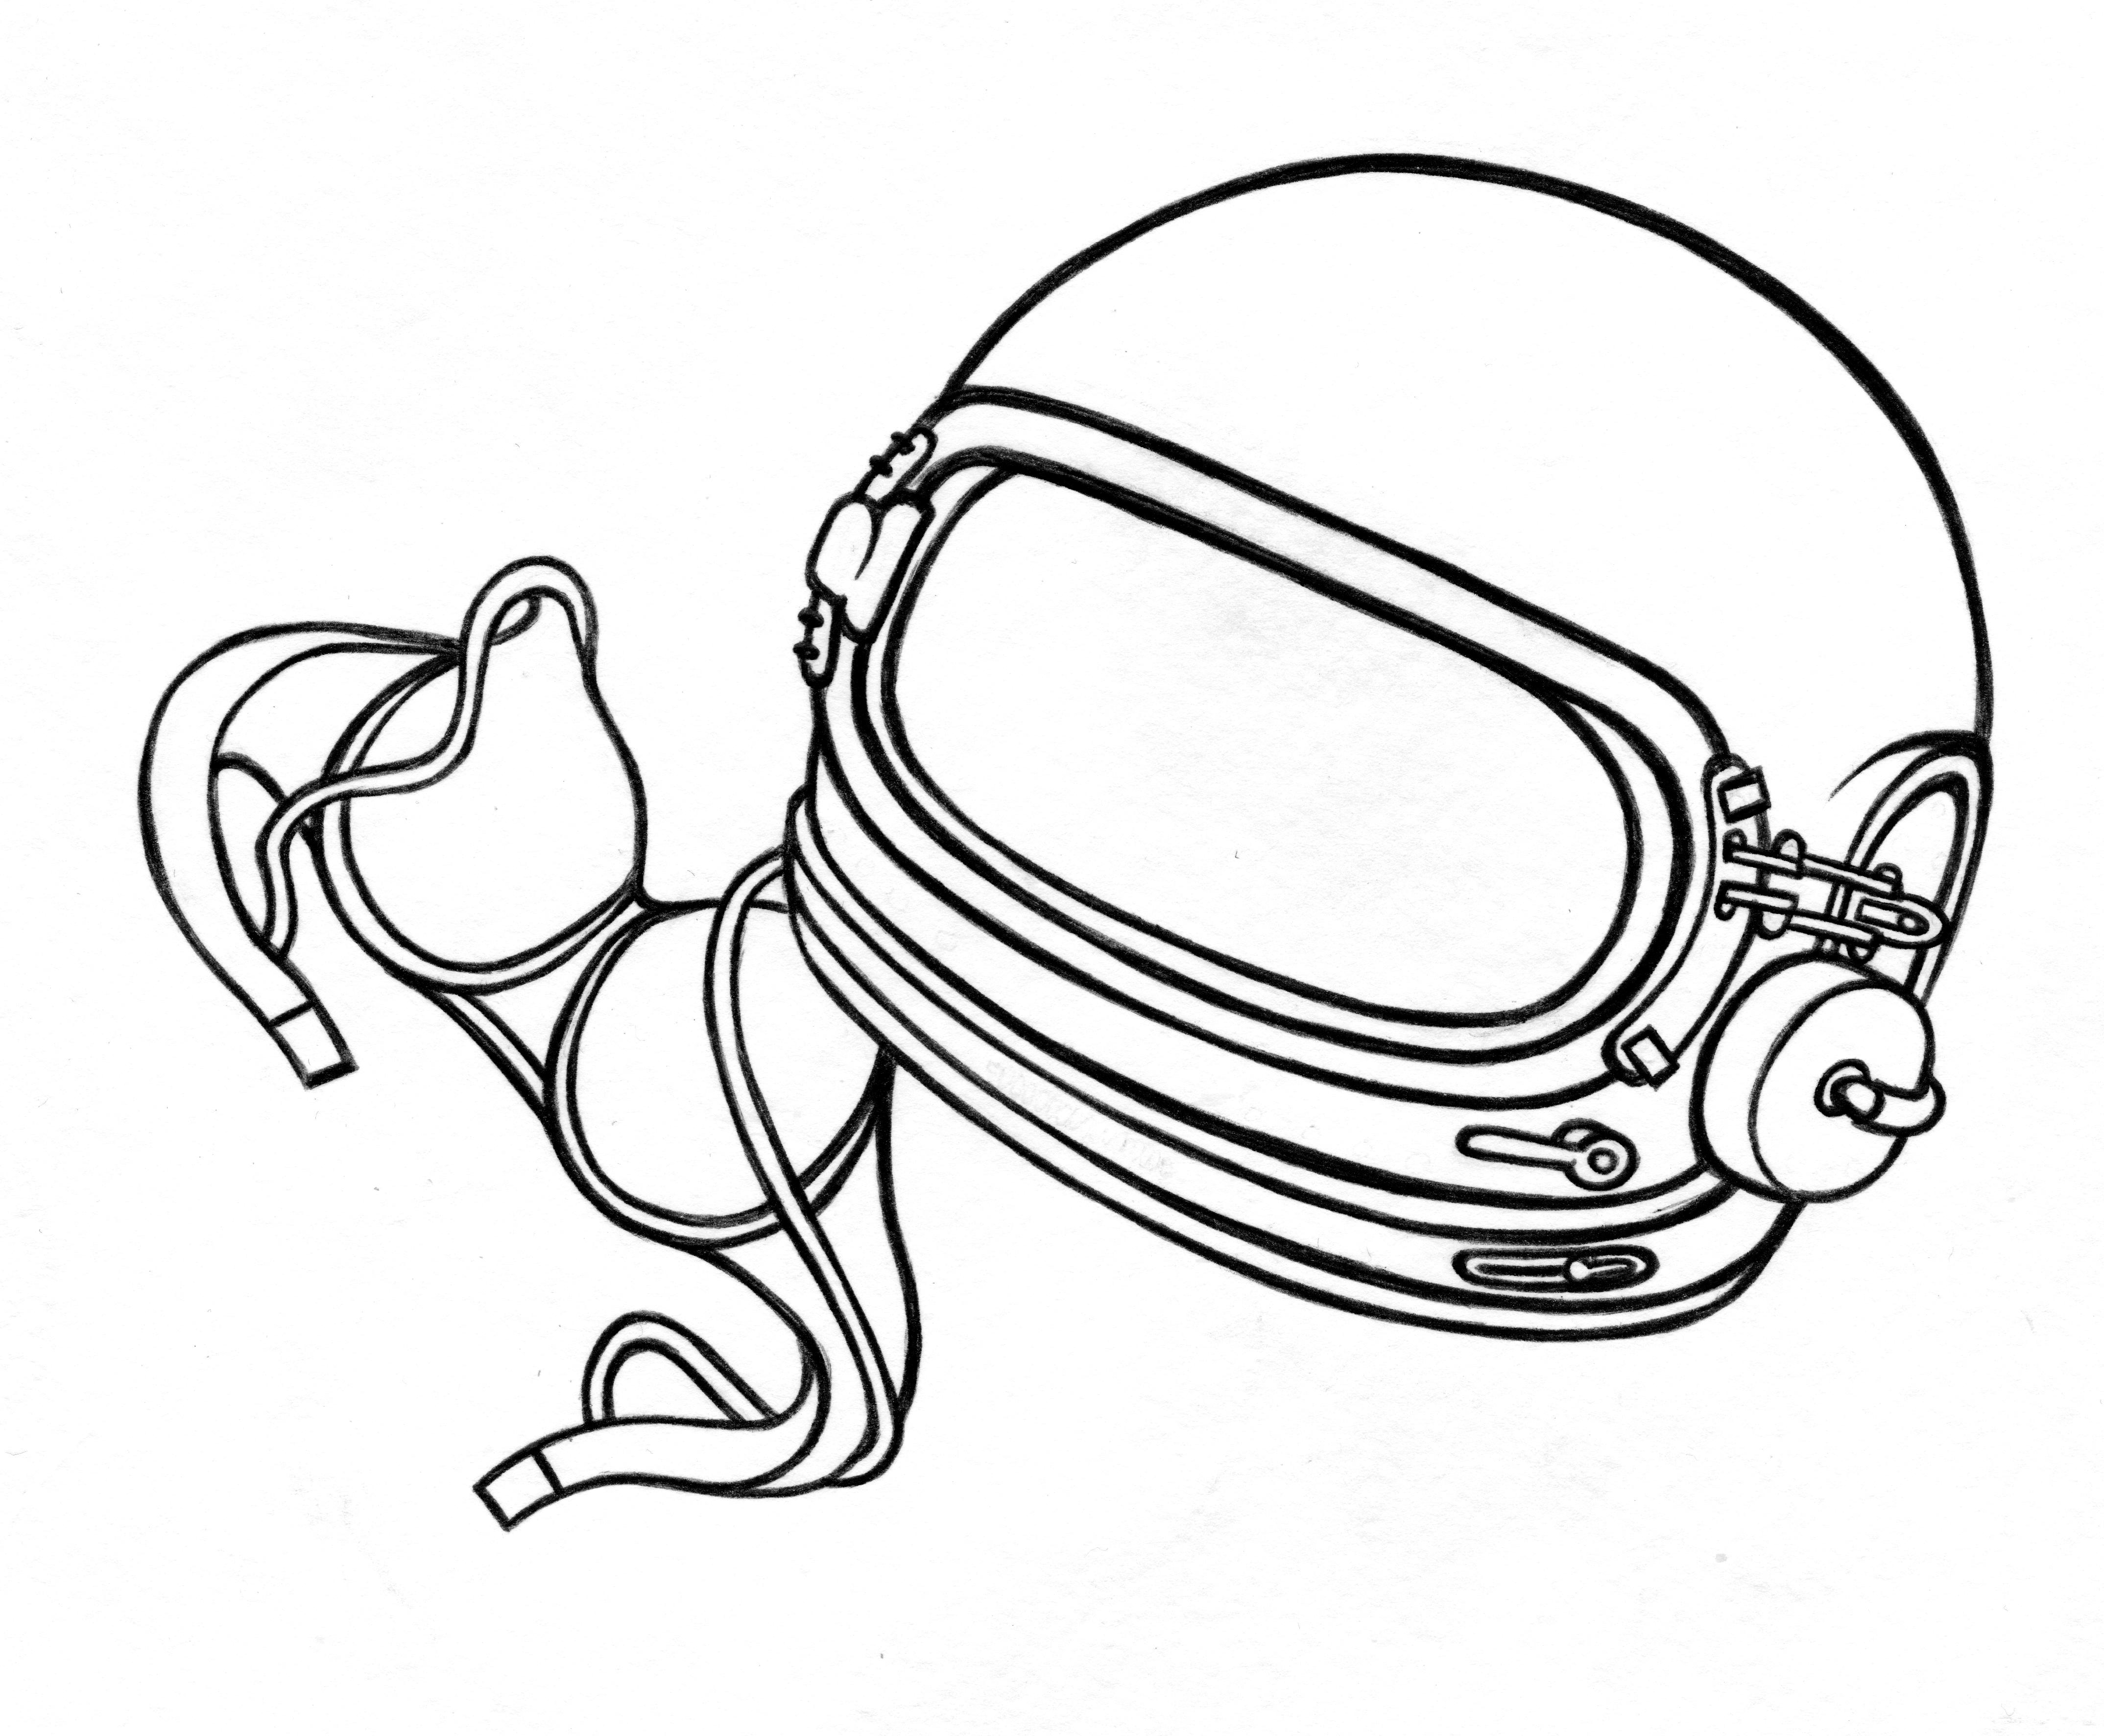 helmet_bra_1_levels_11454893366_o